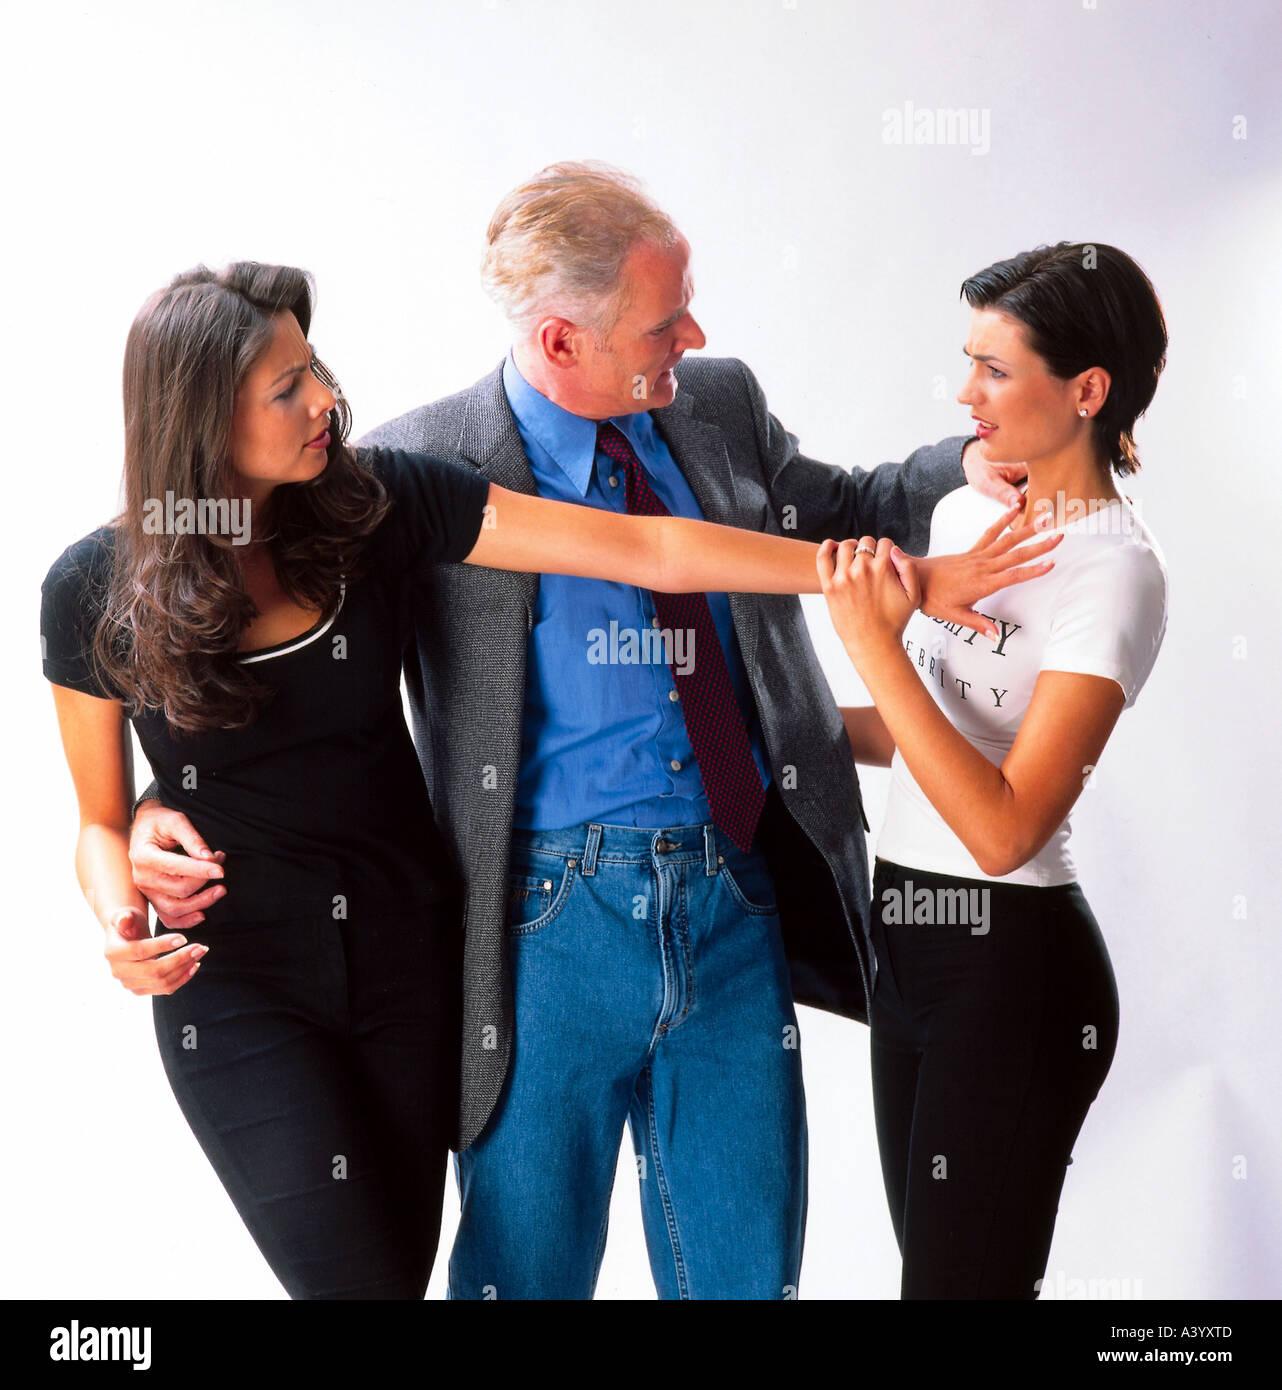 man flirting with two women jealousy - Stock Image